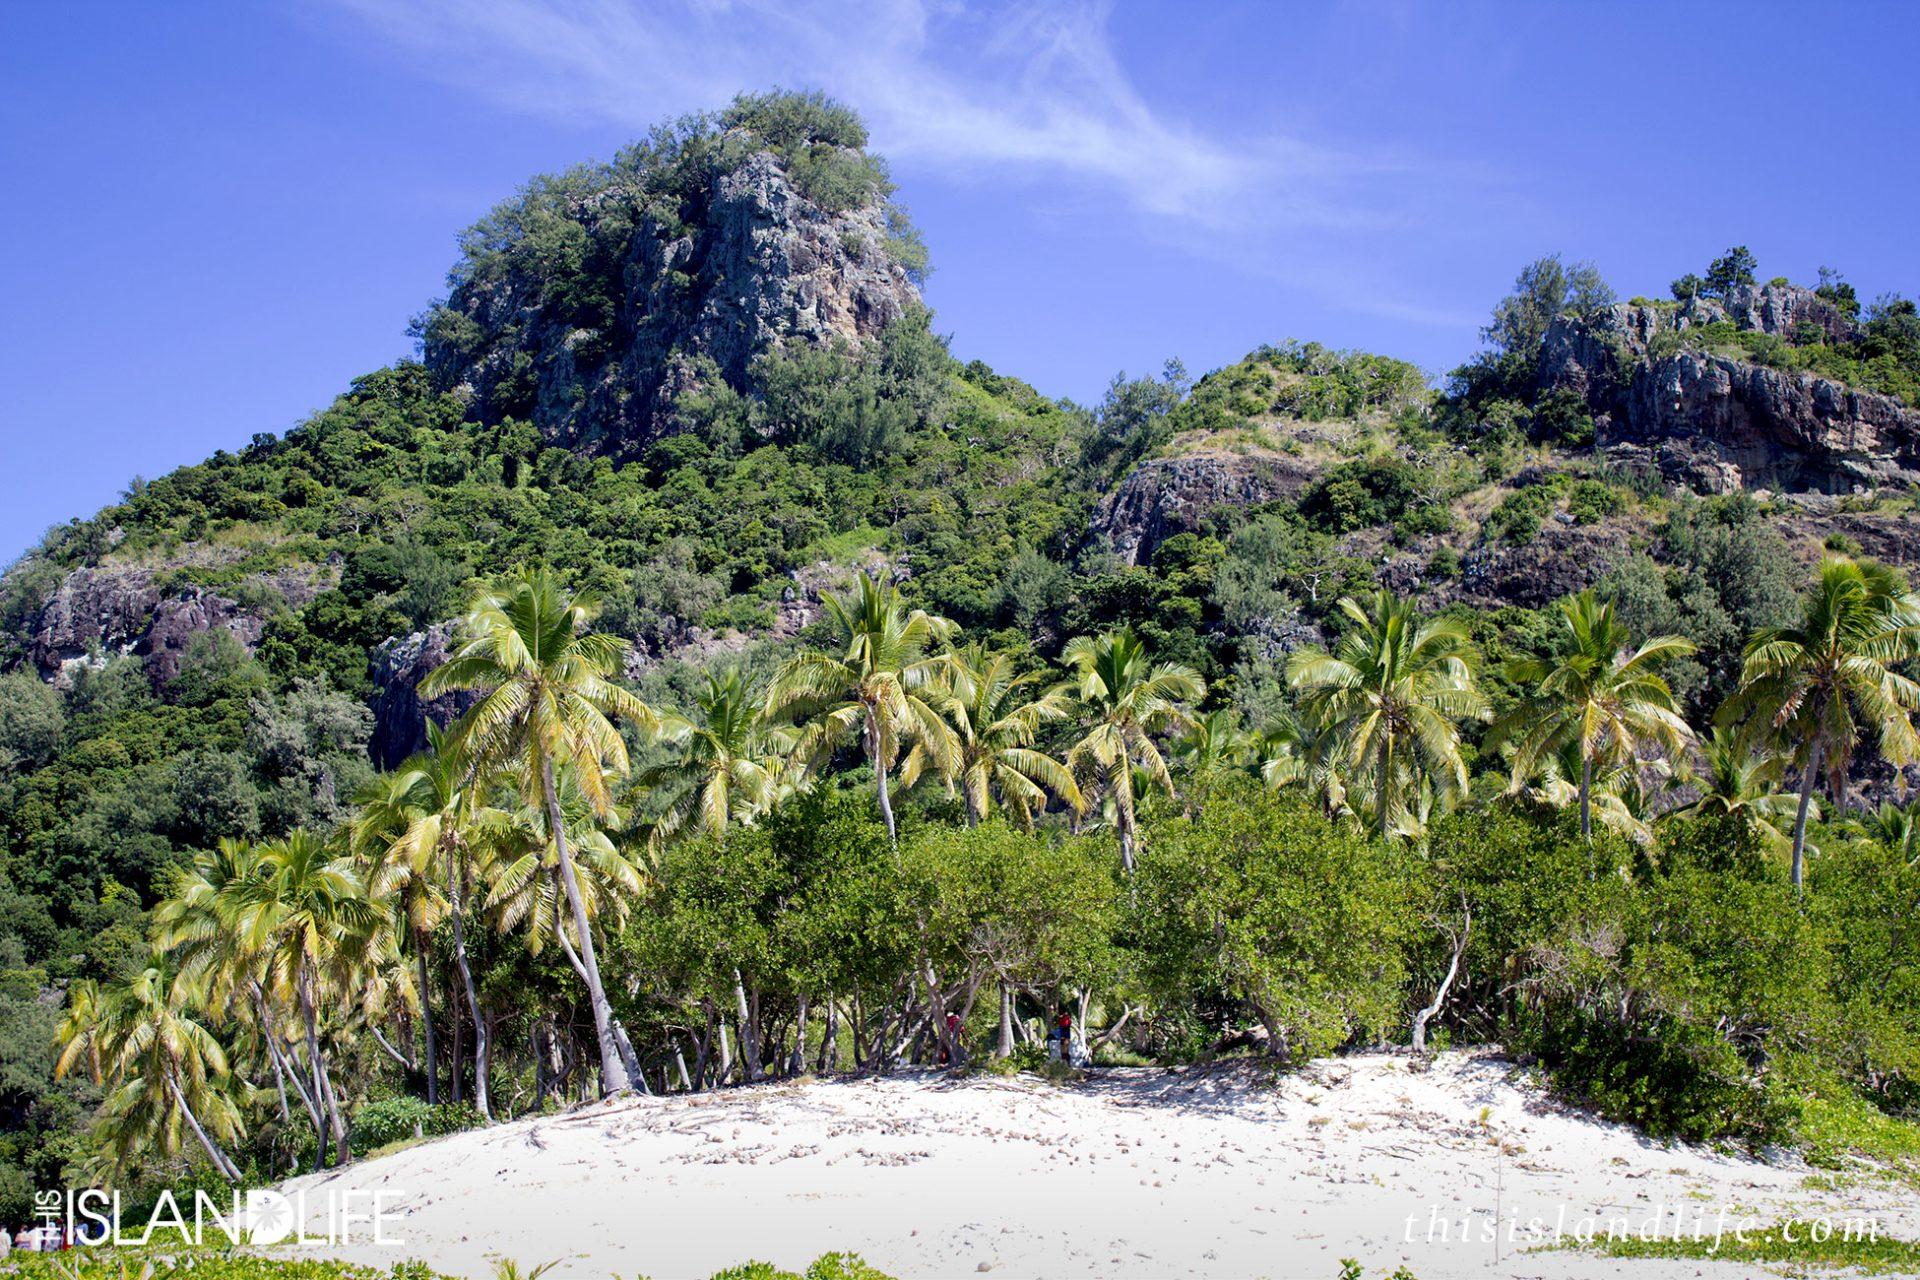 THIS ISLAND LIFE |Cast Away Island (Monuriki Island), Fiji